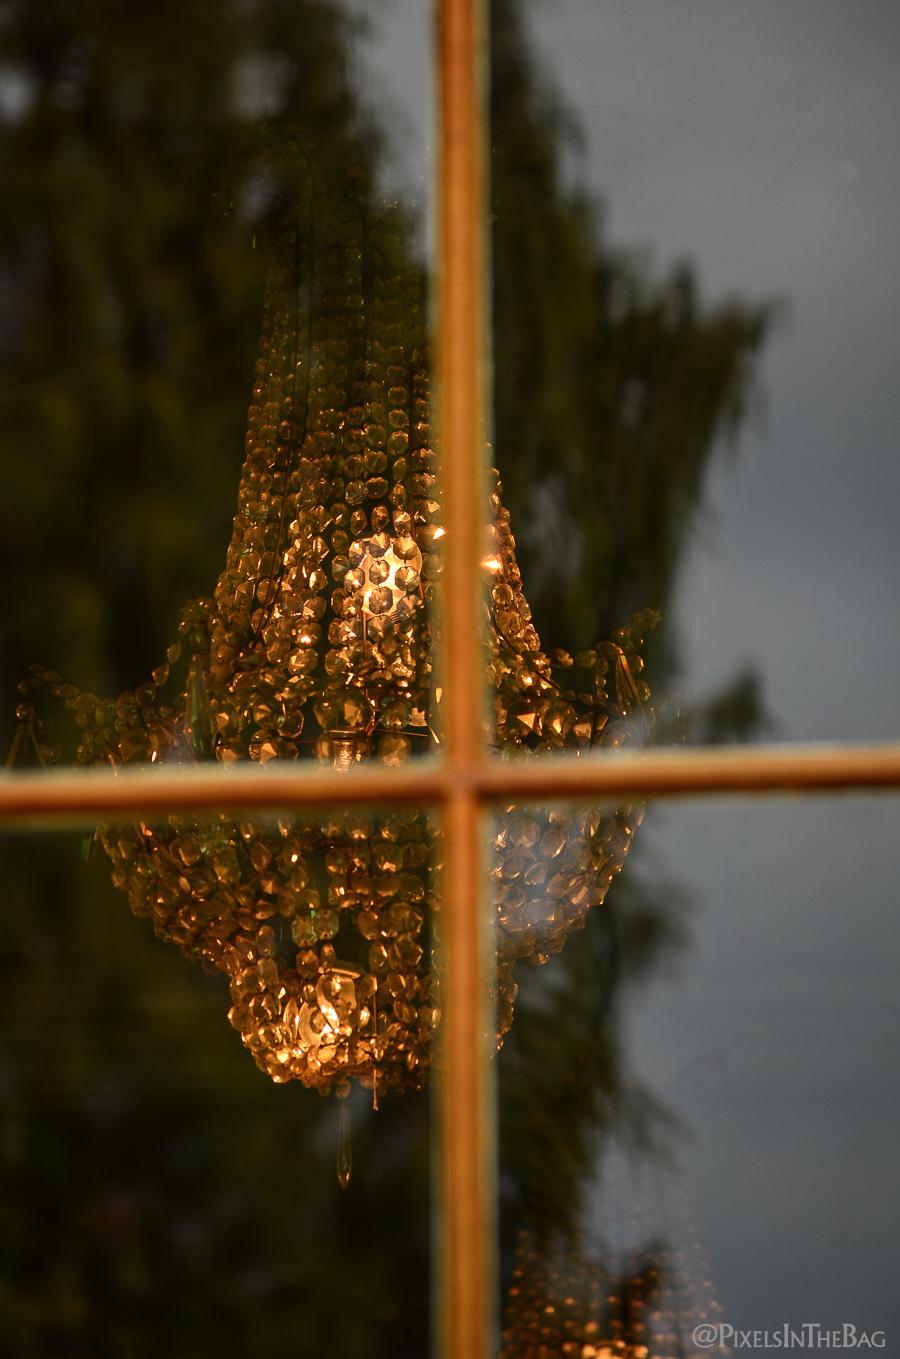 A chandelier inside the Enghien Chateau.